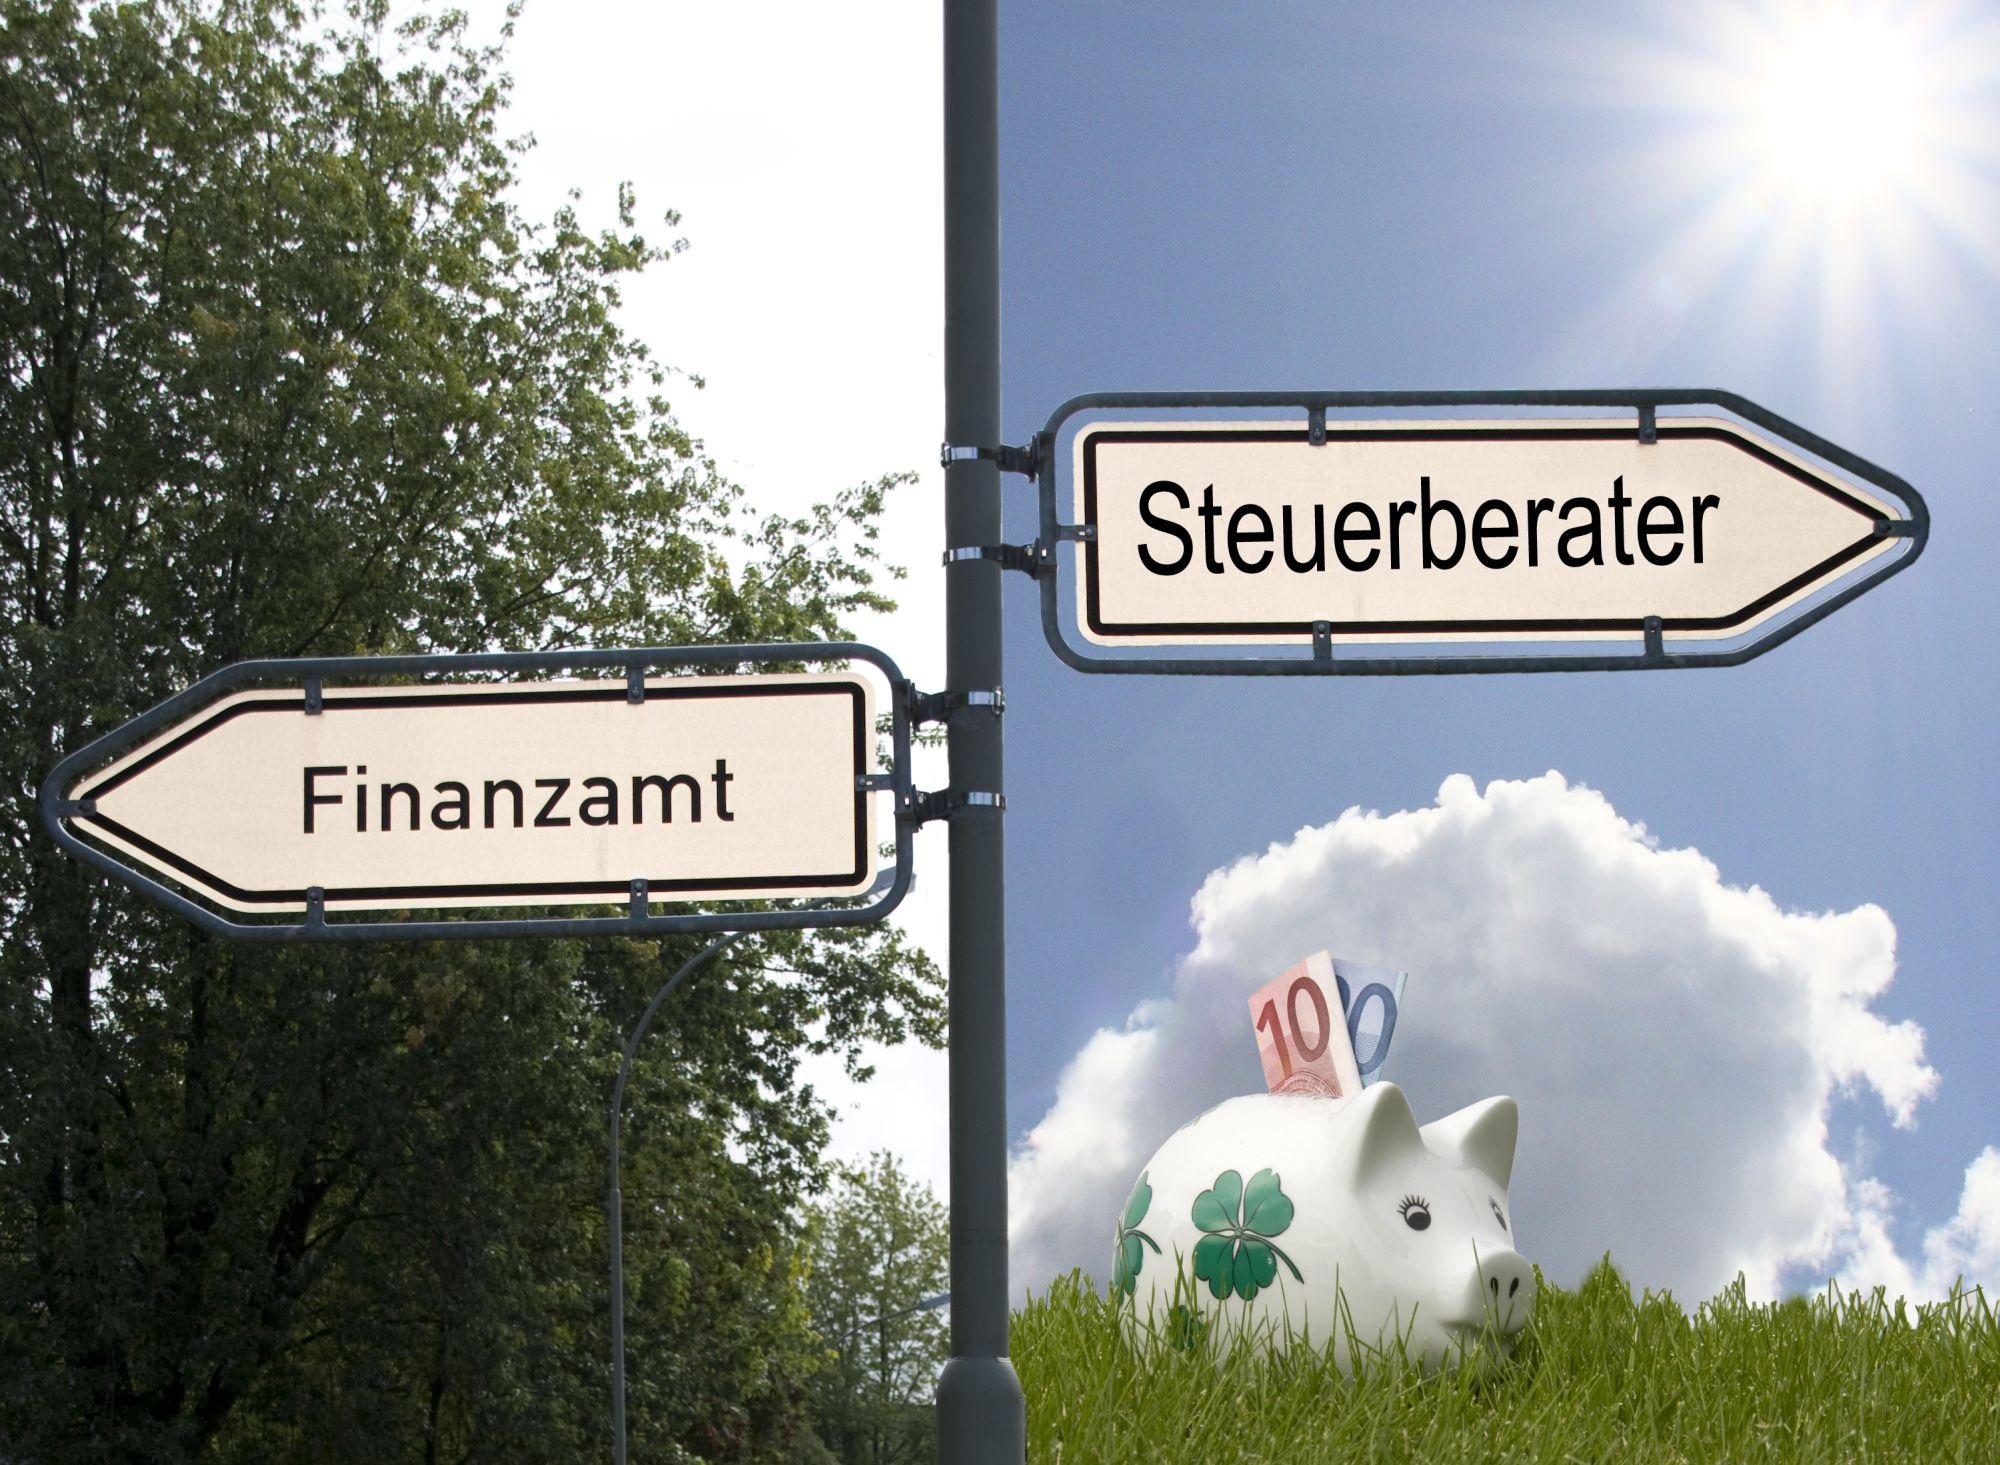 Finanzamt / Steuerberater